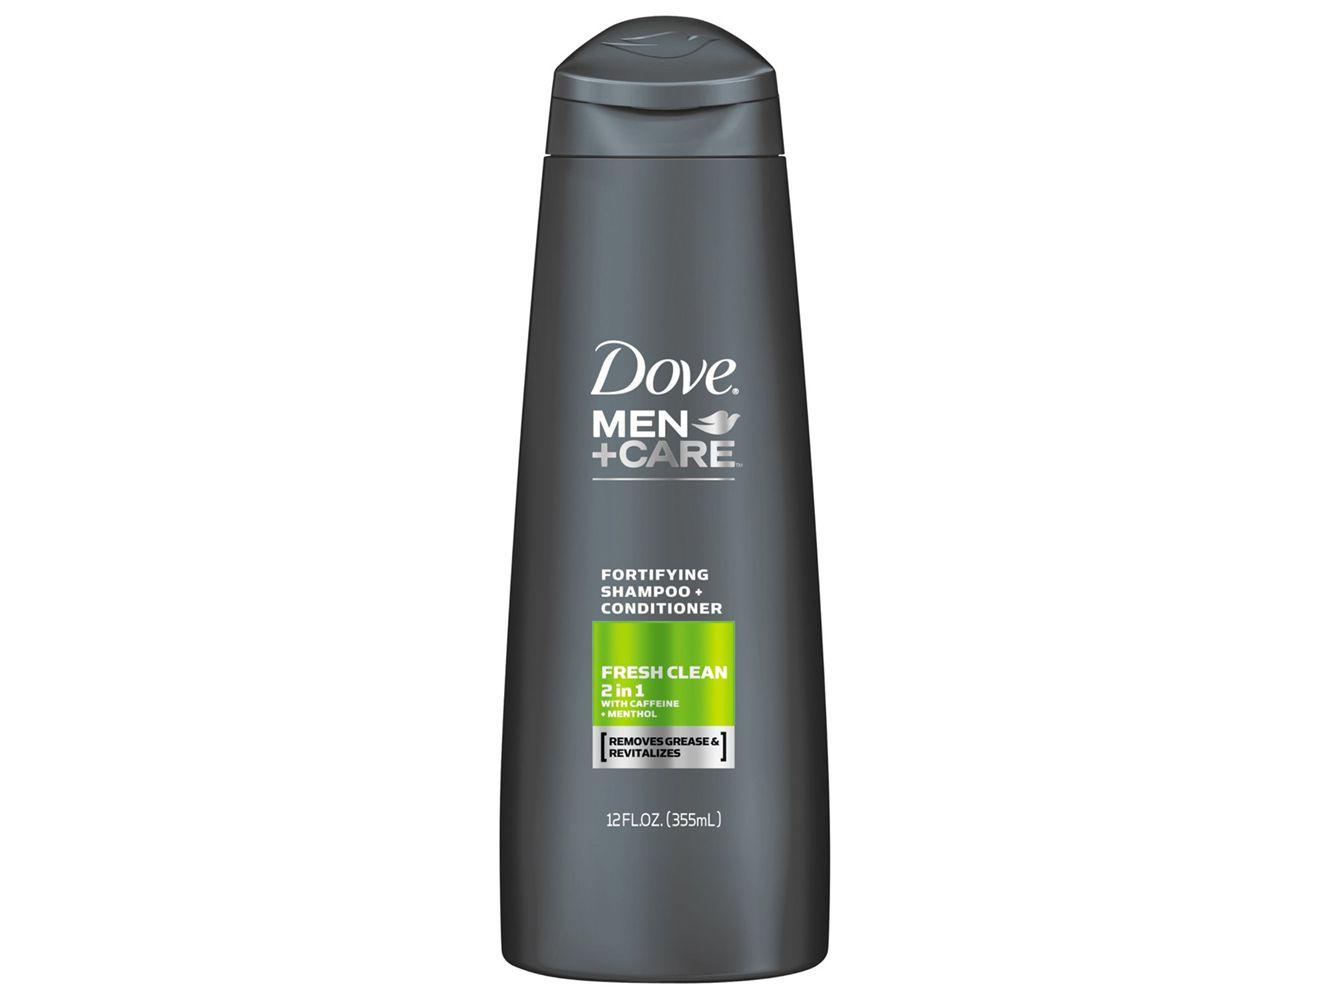 Dove Men+Care Fresh Clean 2 in 1 Shampoo/Conditioner Review